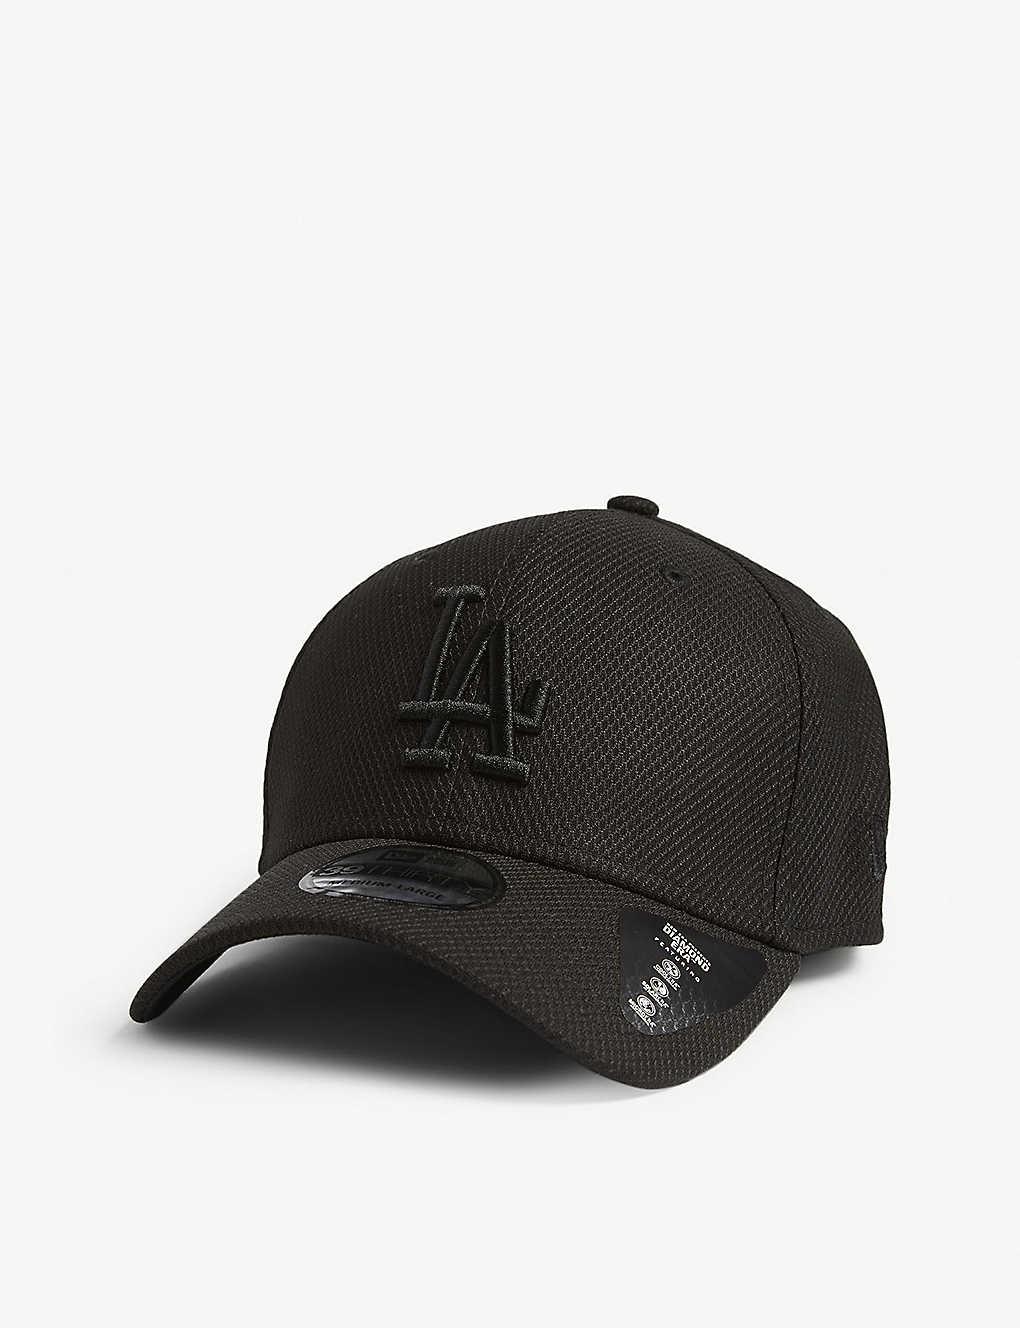 5b1a8e1d13f40 Los Angeles Dodgers 39THIRTY baseball cap - Black ...